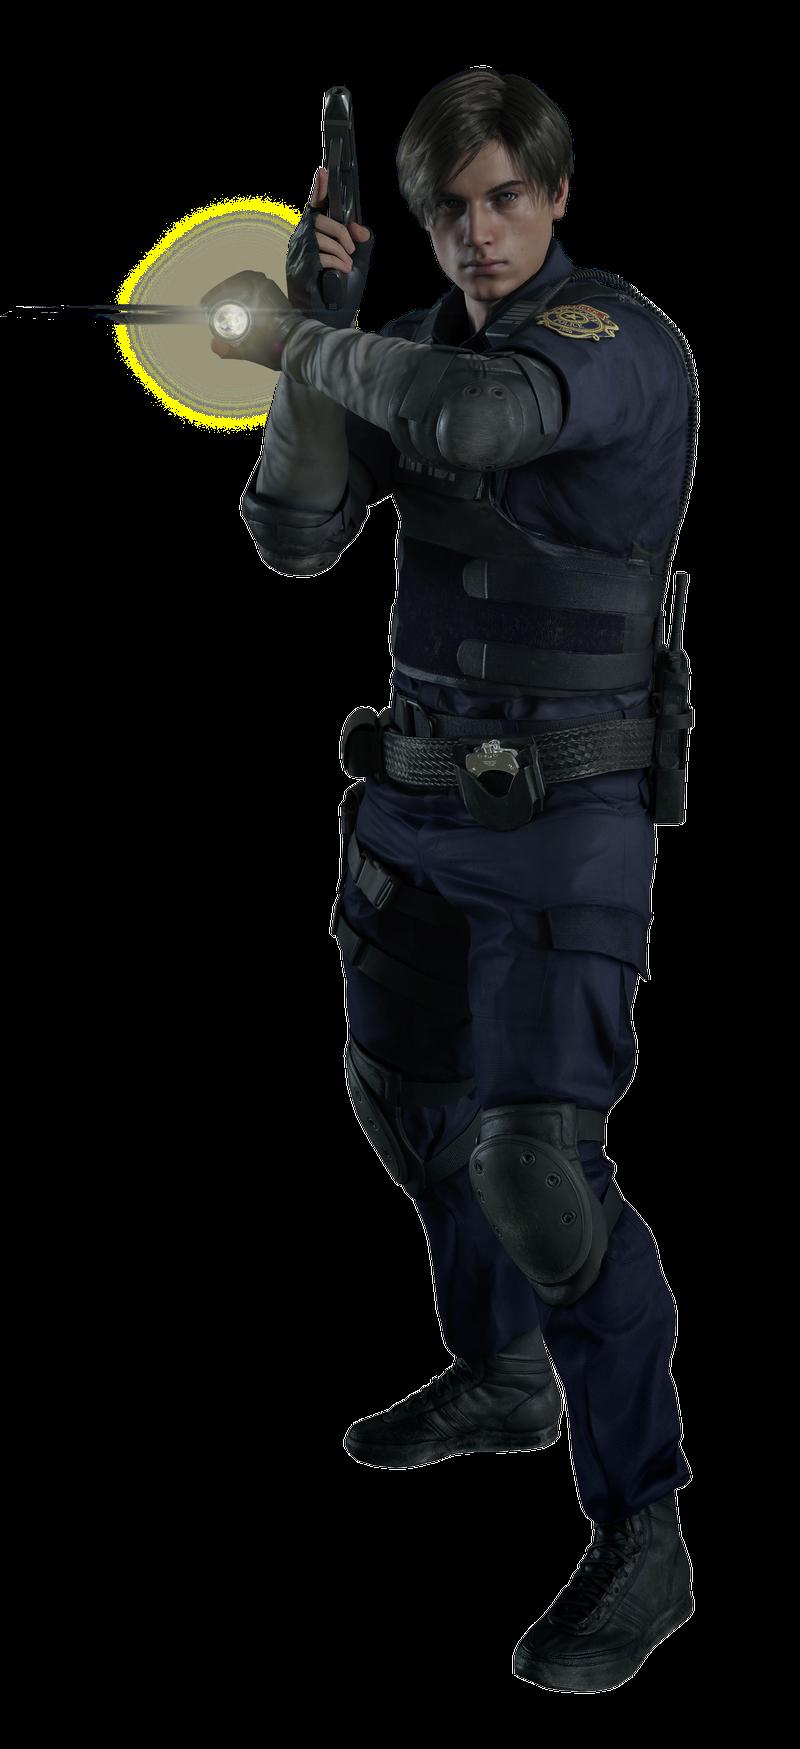 Resident Evil 2 2019 Leon S Kennedy Png 1 By Mintmovi3 On Deviantart Resident Evil Leon S Kennedy Leon Scott Kennedy